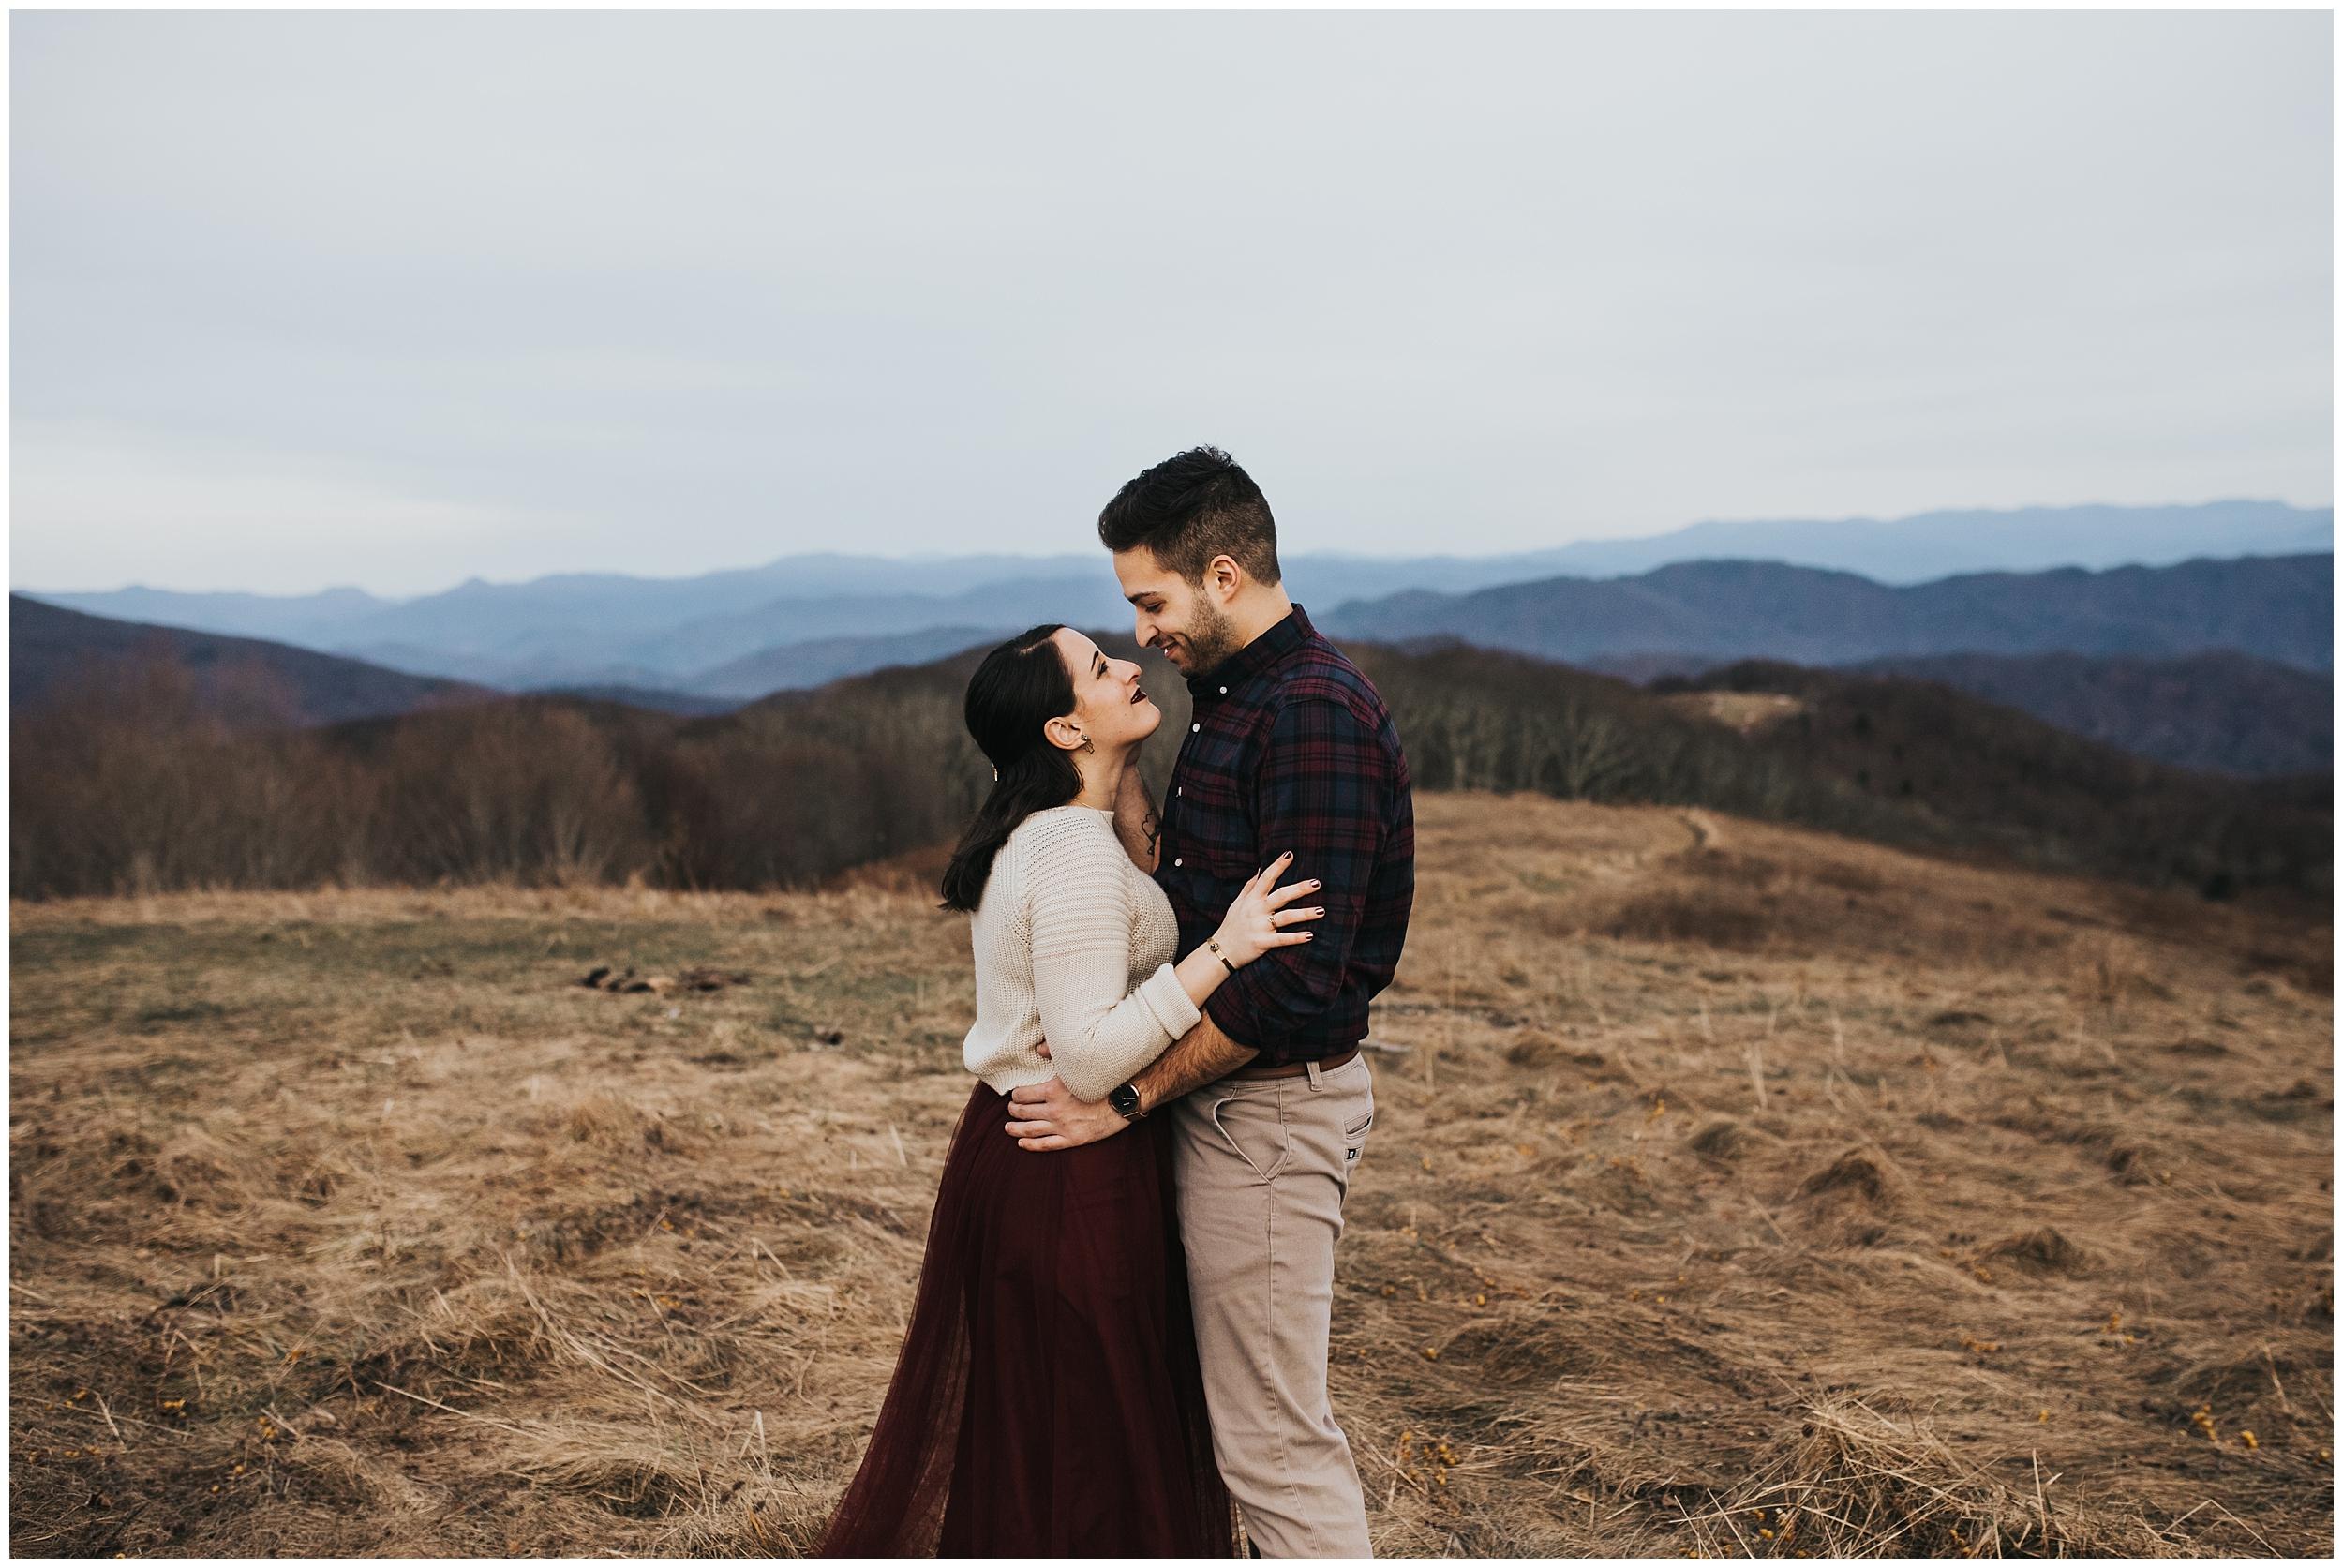 lovestoriesco-asheville-wedding-photographers-engagement-max-patch-mountain_0020.jpg